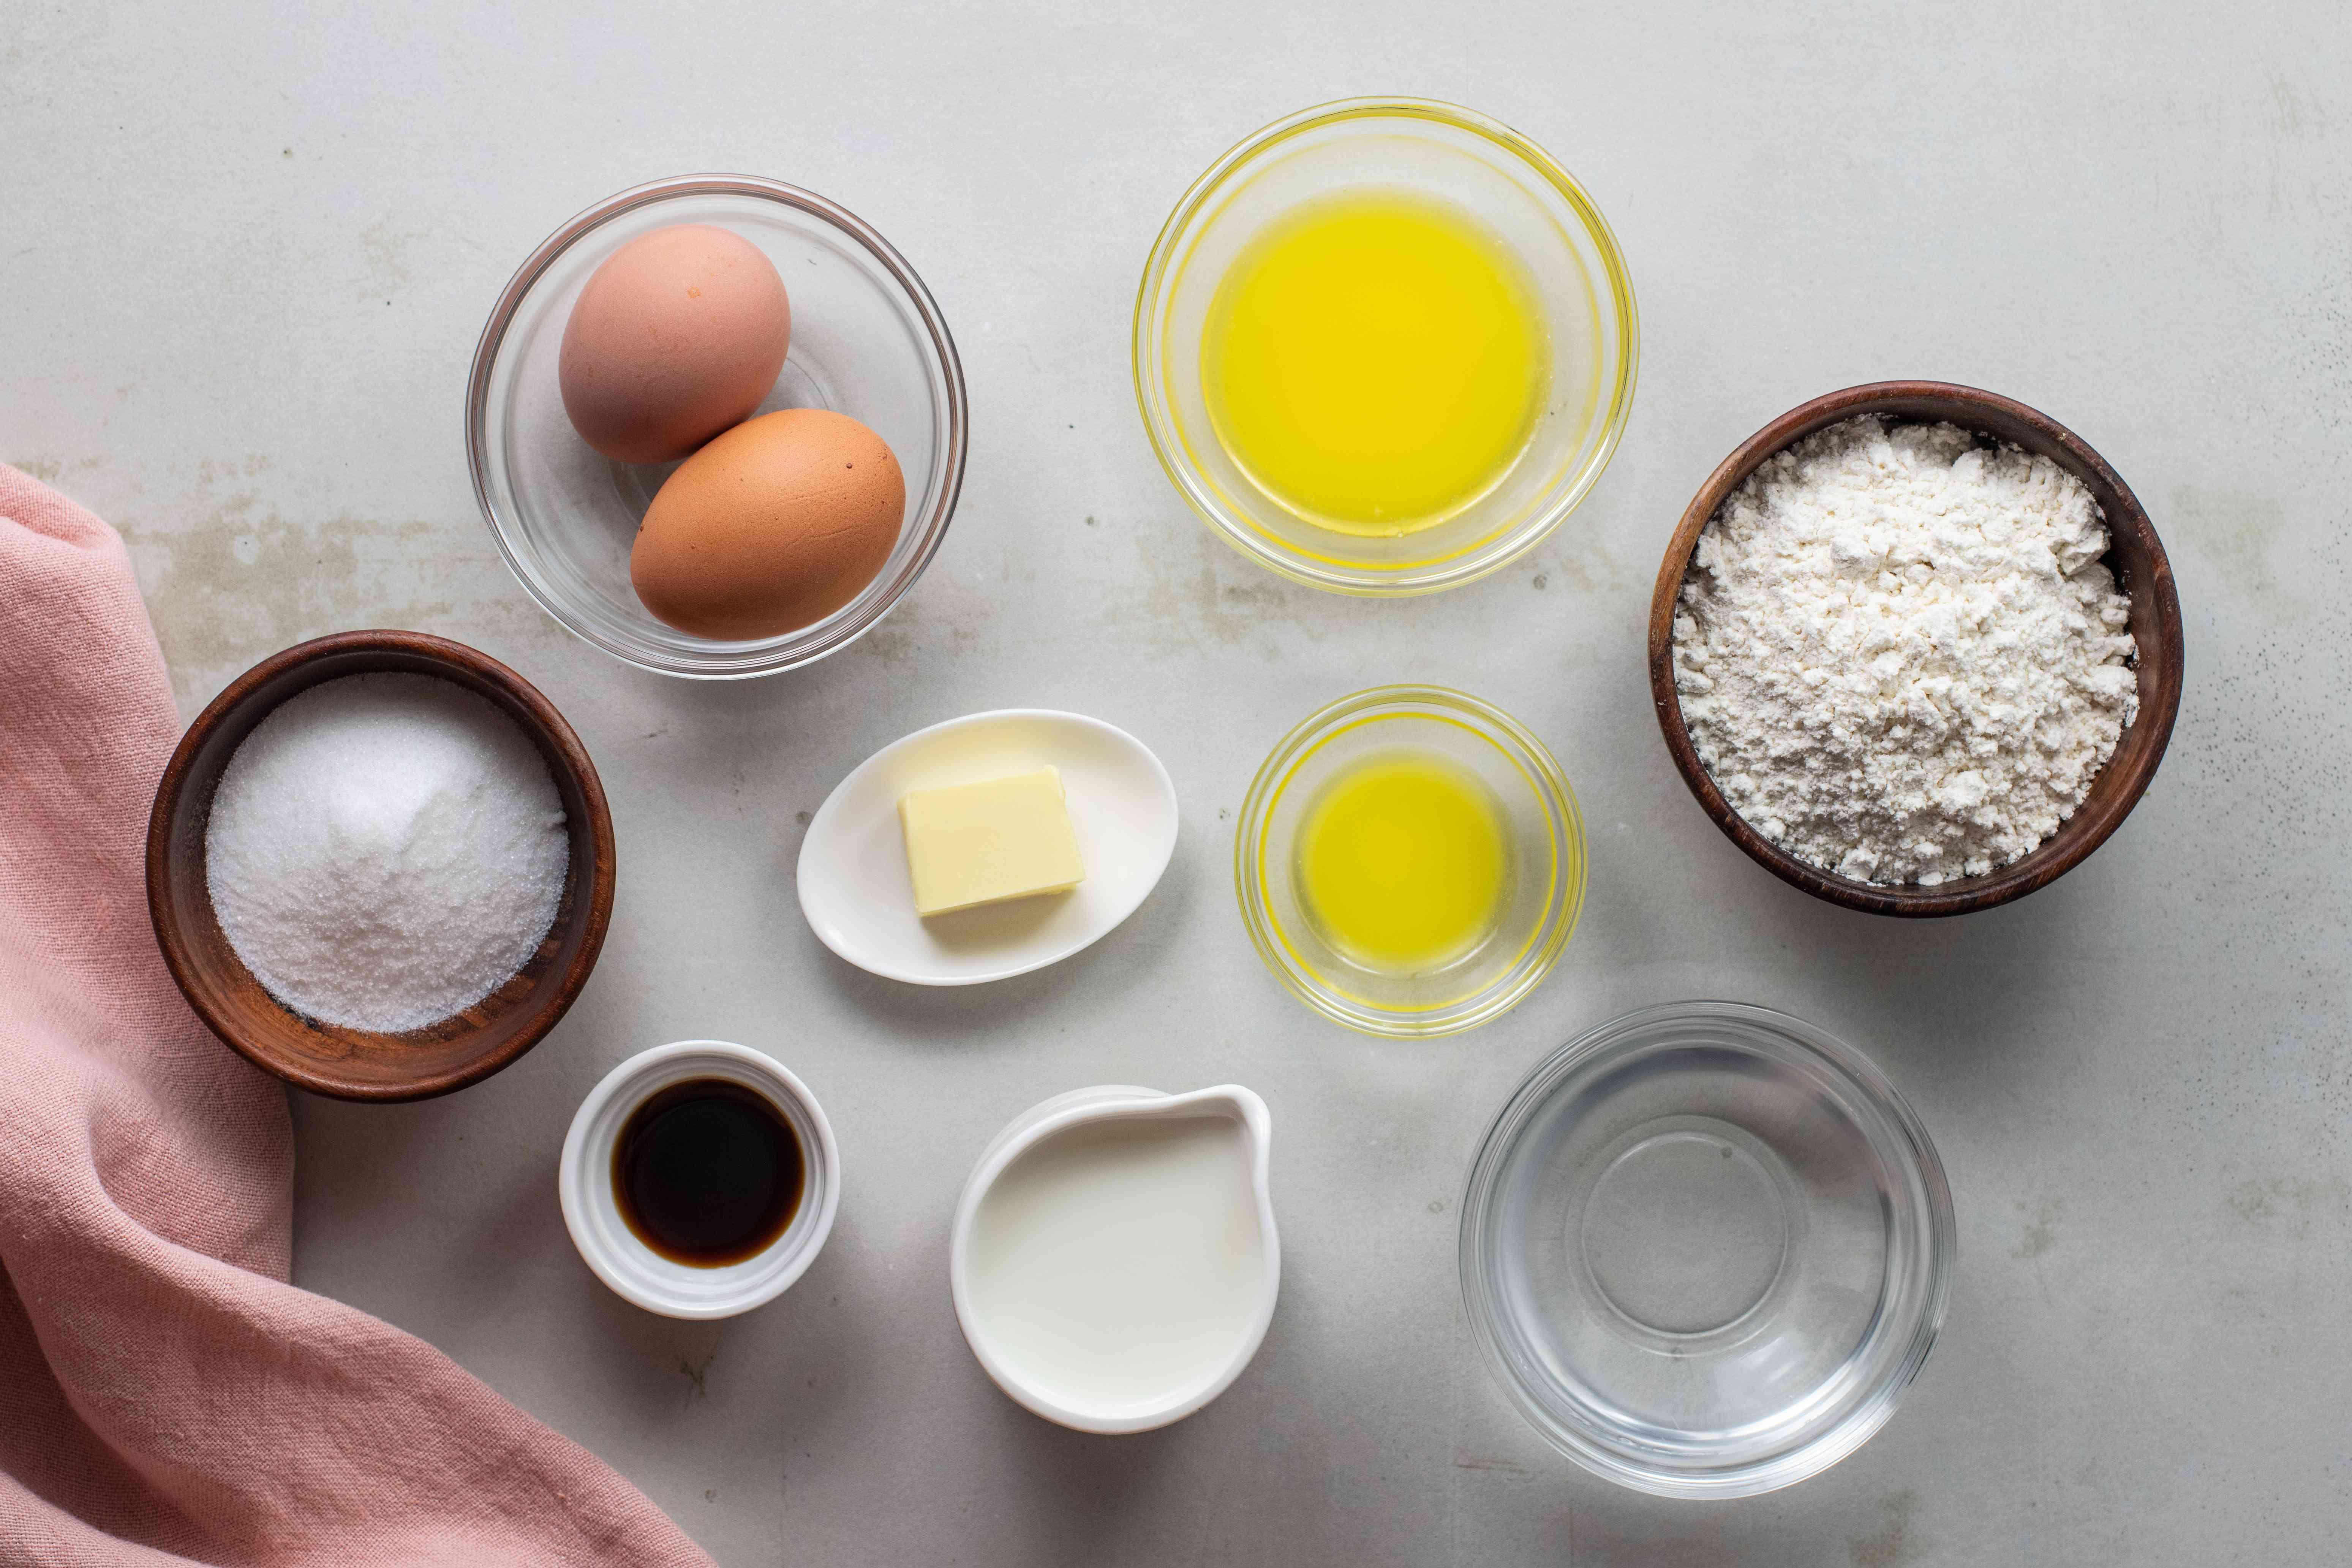 Ingredients for crepe filling